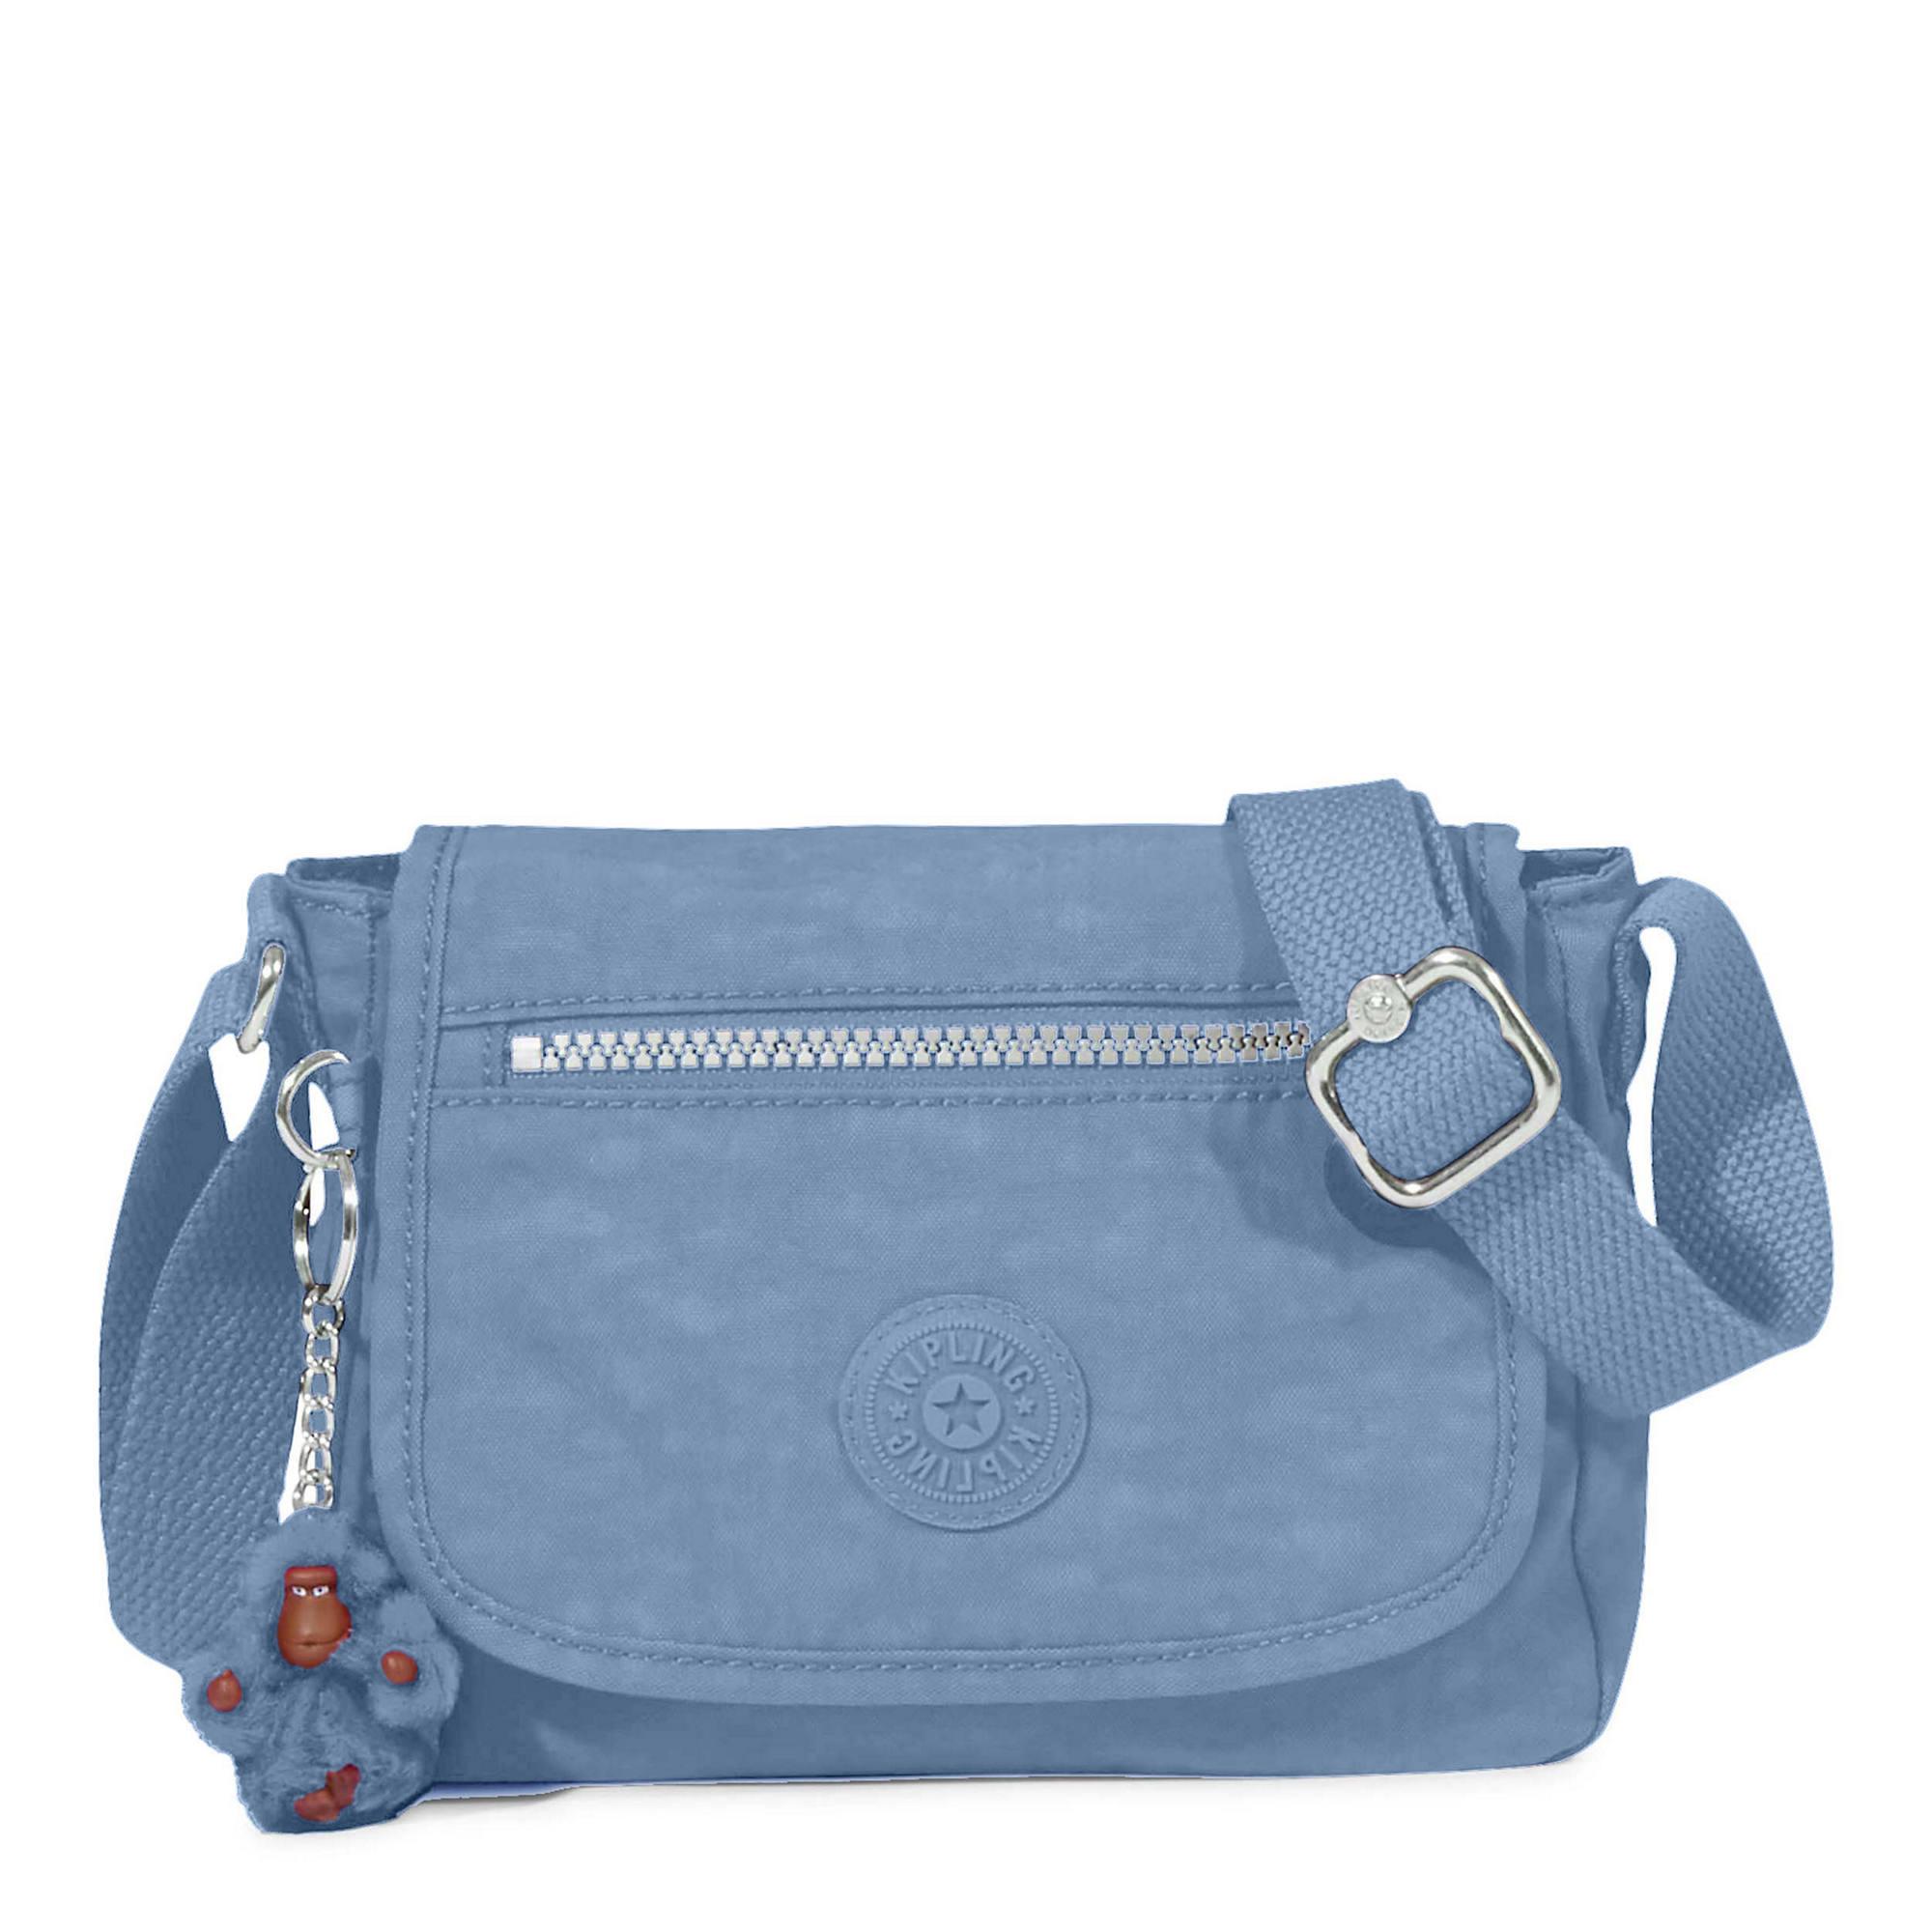 2042610c90dfb Kipling Sabian Crossbody Mini Bag  20